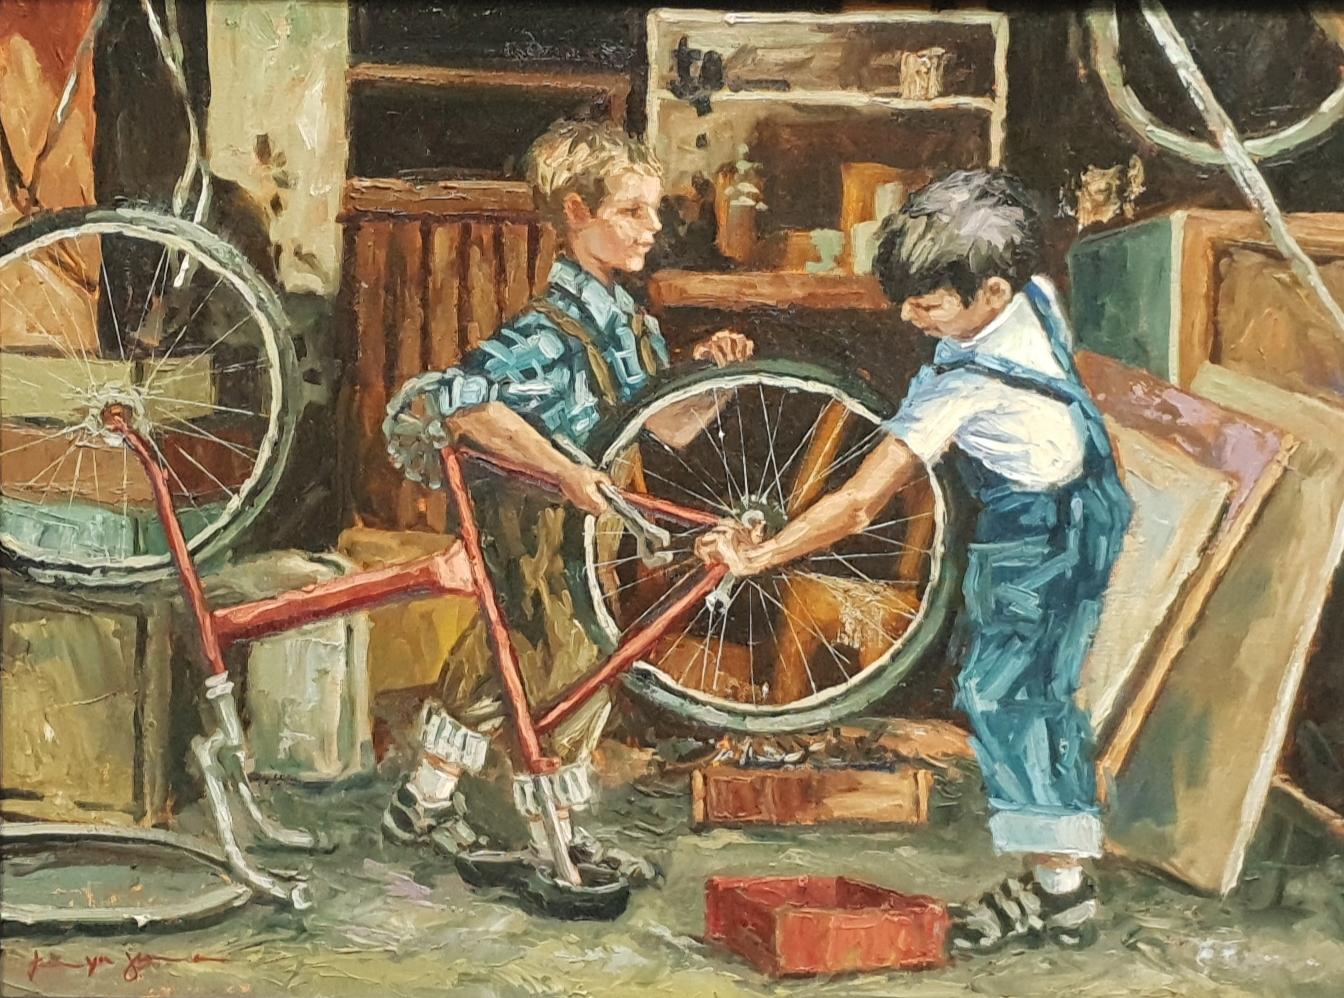 tanya jansen fixing the bike